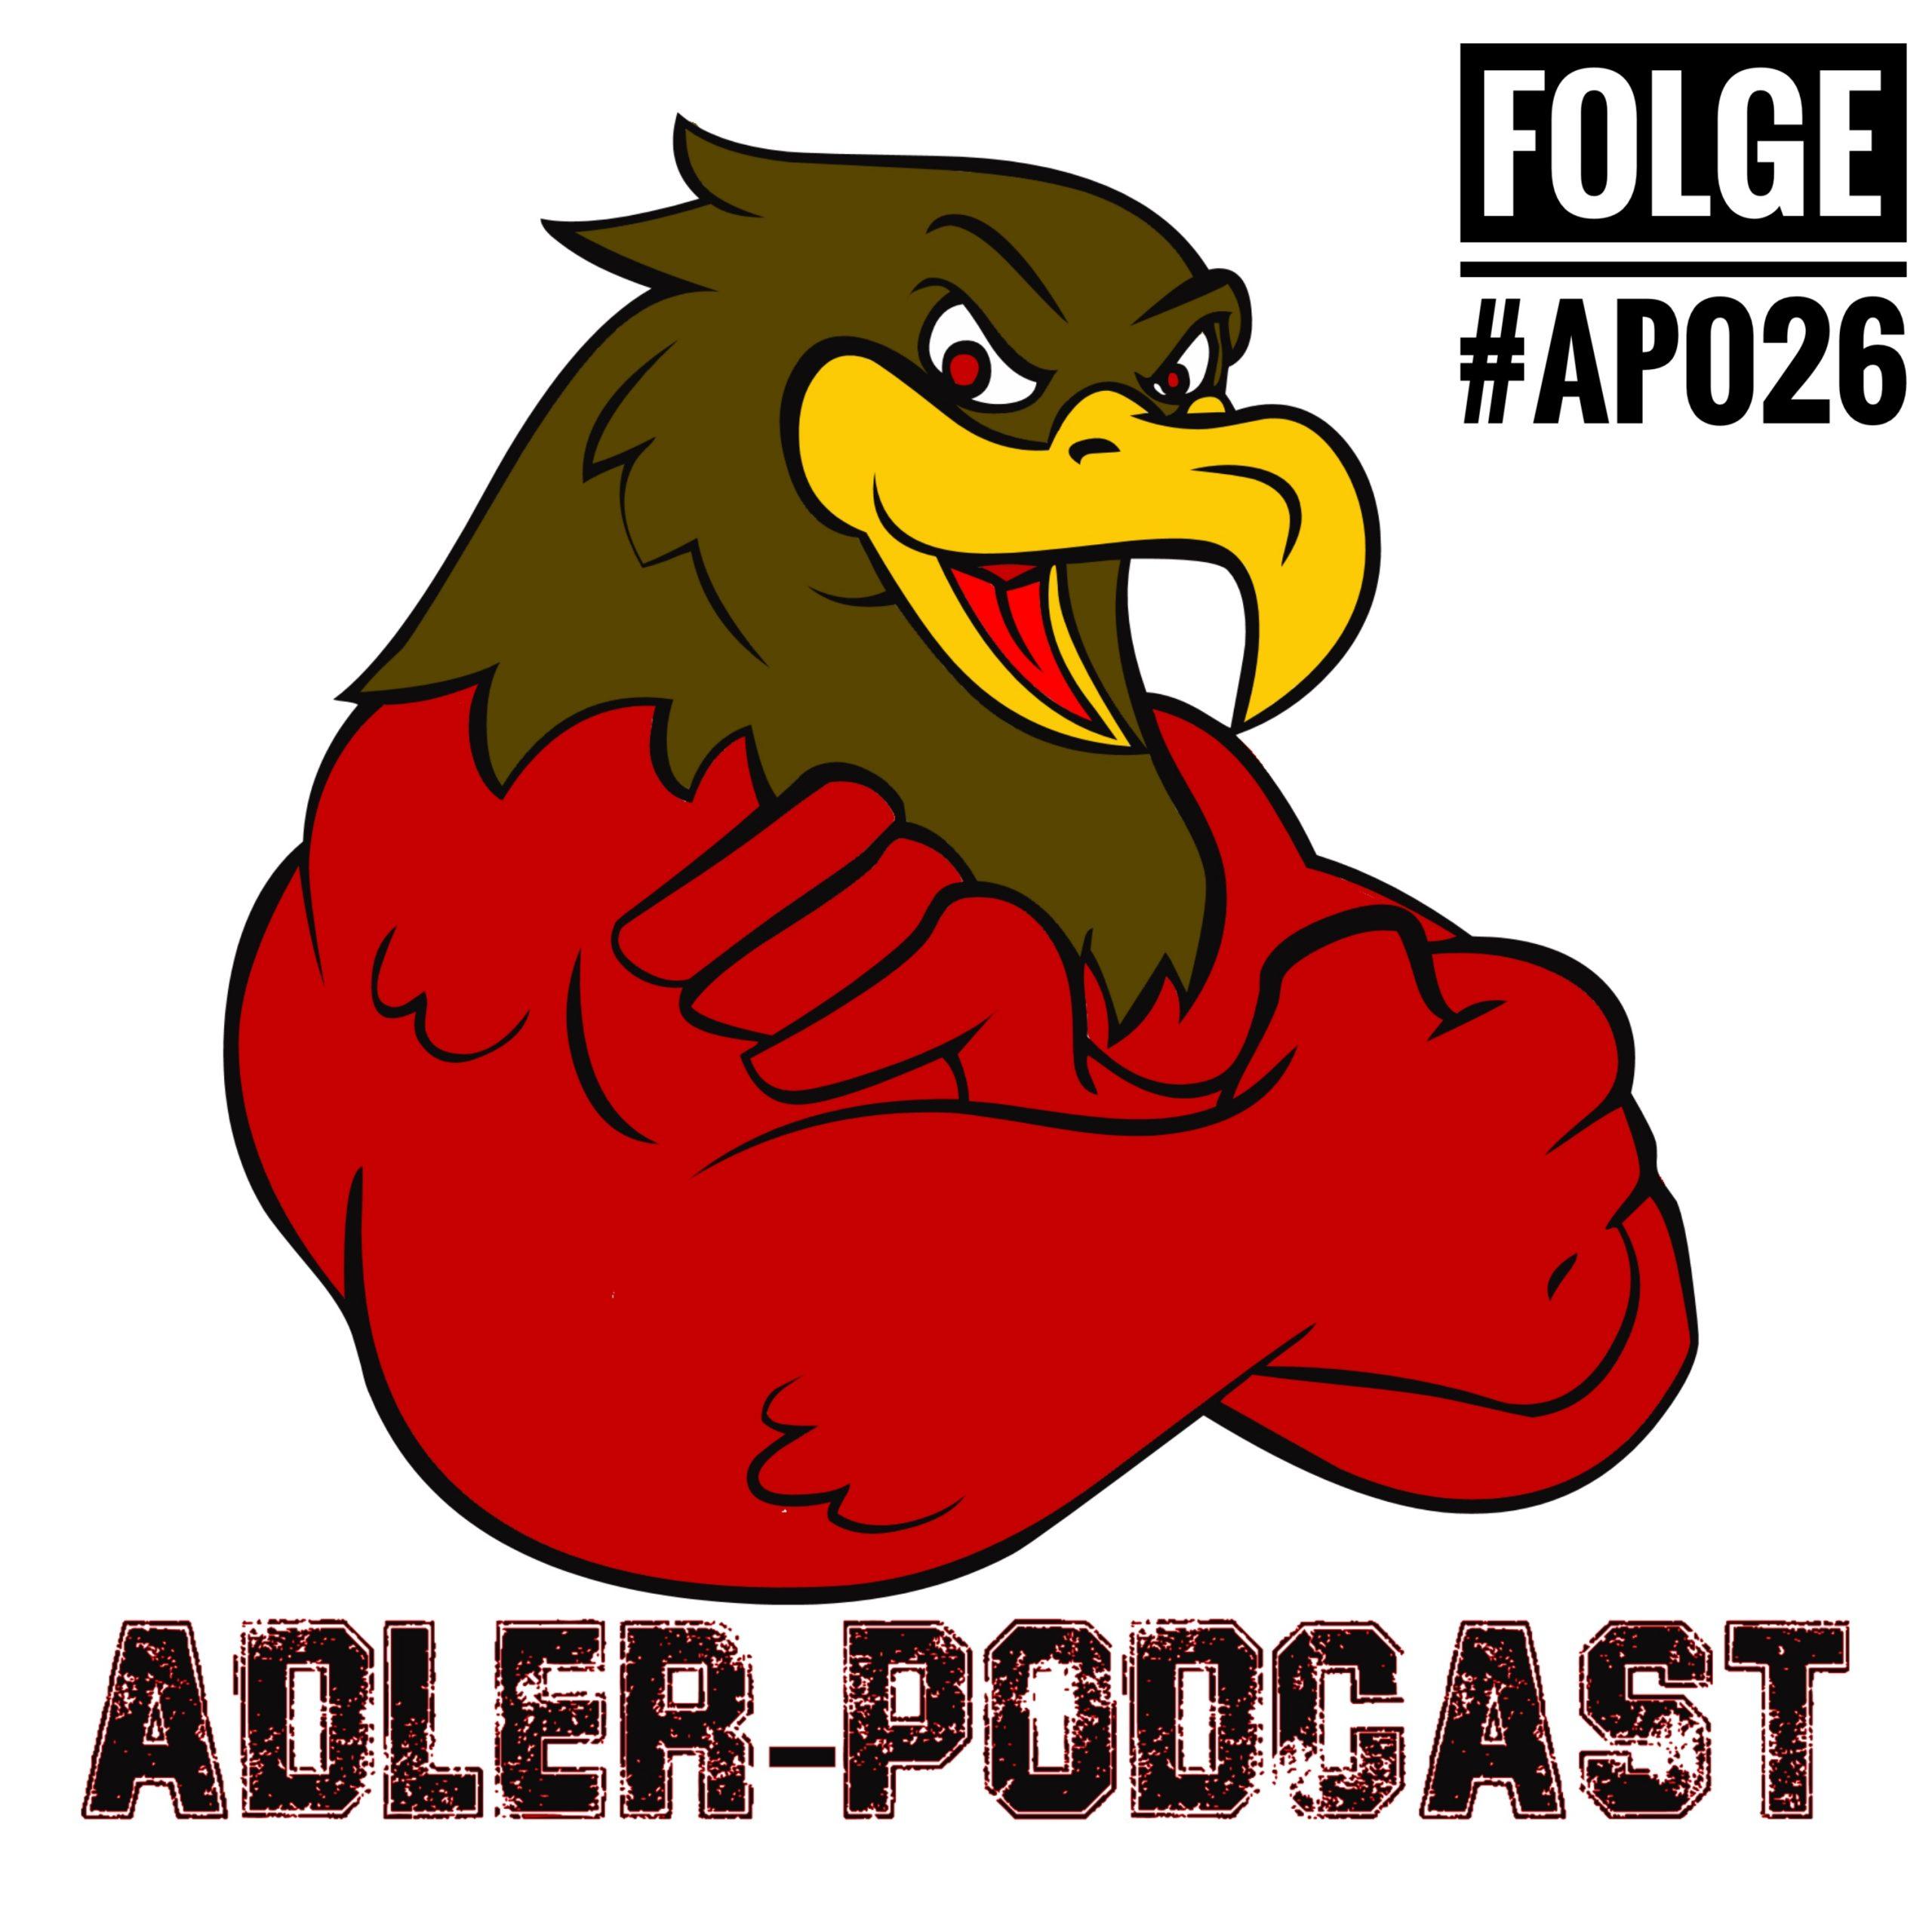 #AP026 - Rant-Voll